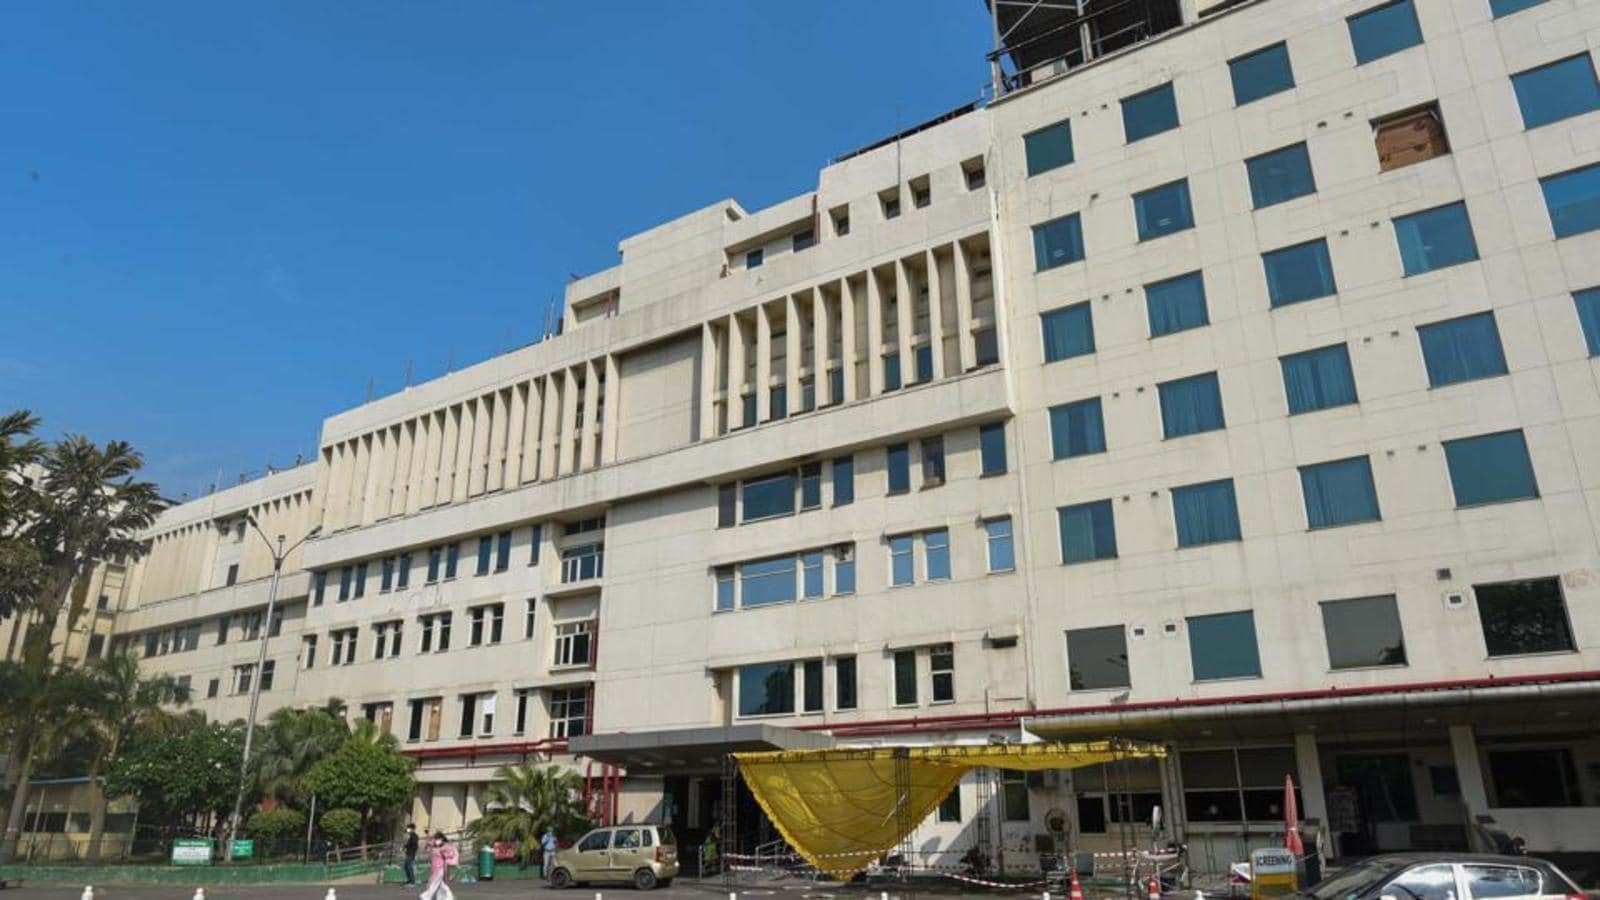 Sir Ganga Ram Hospital, New Delhi